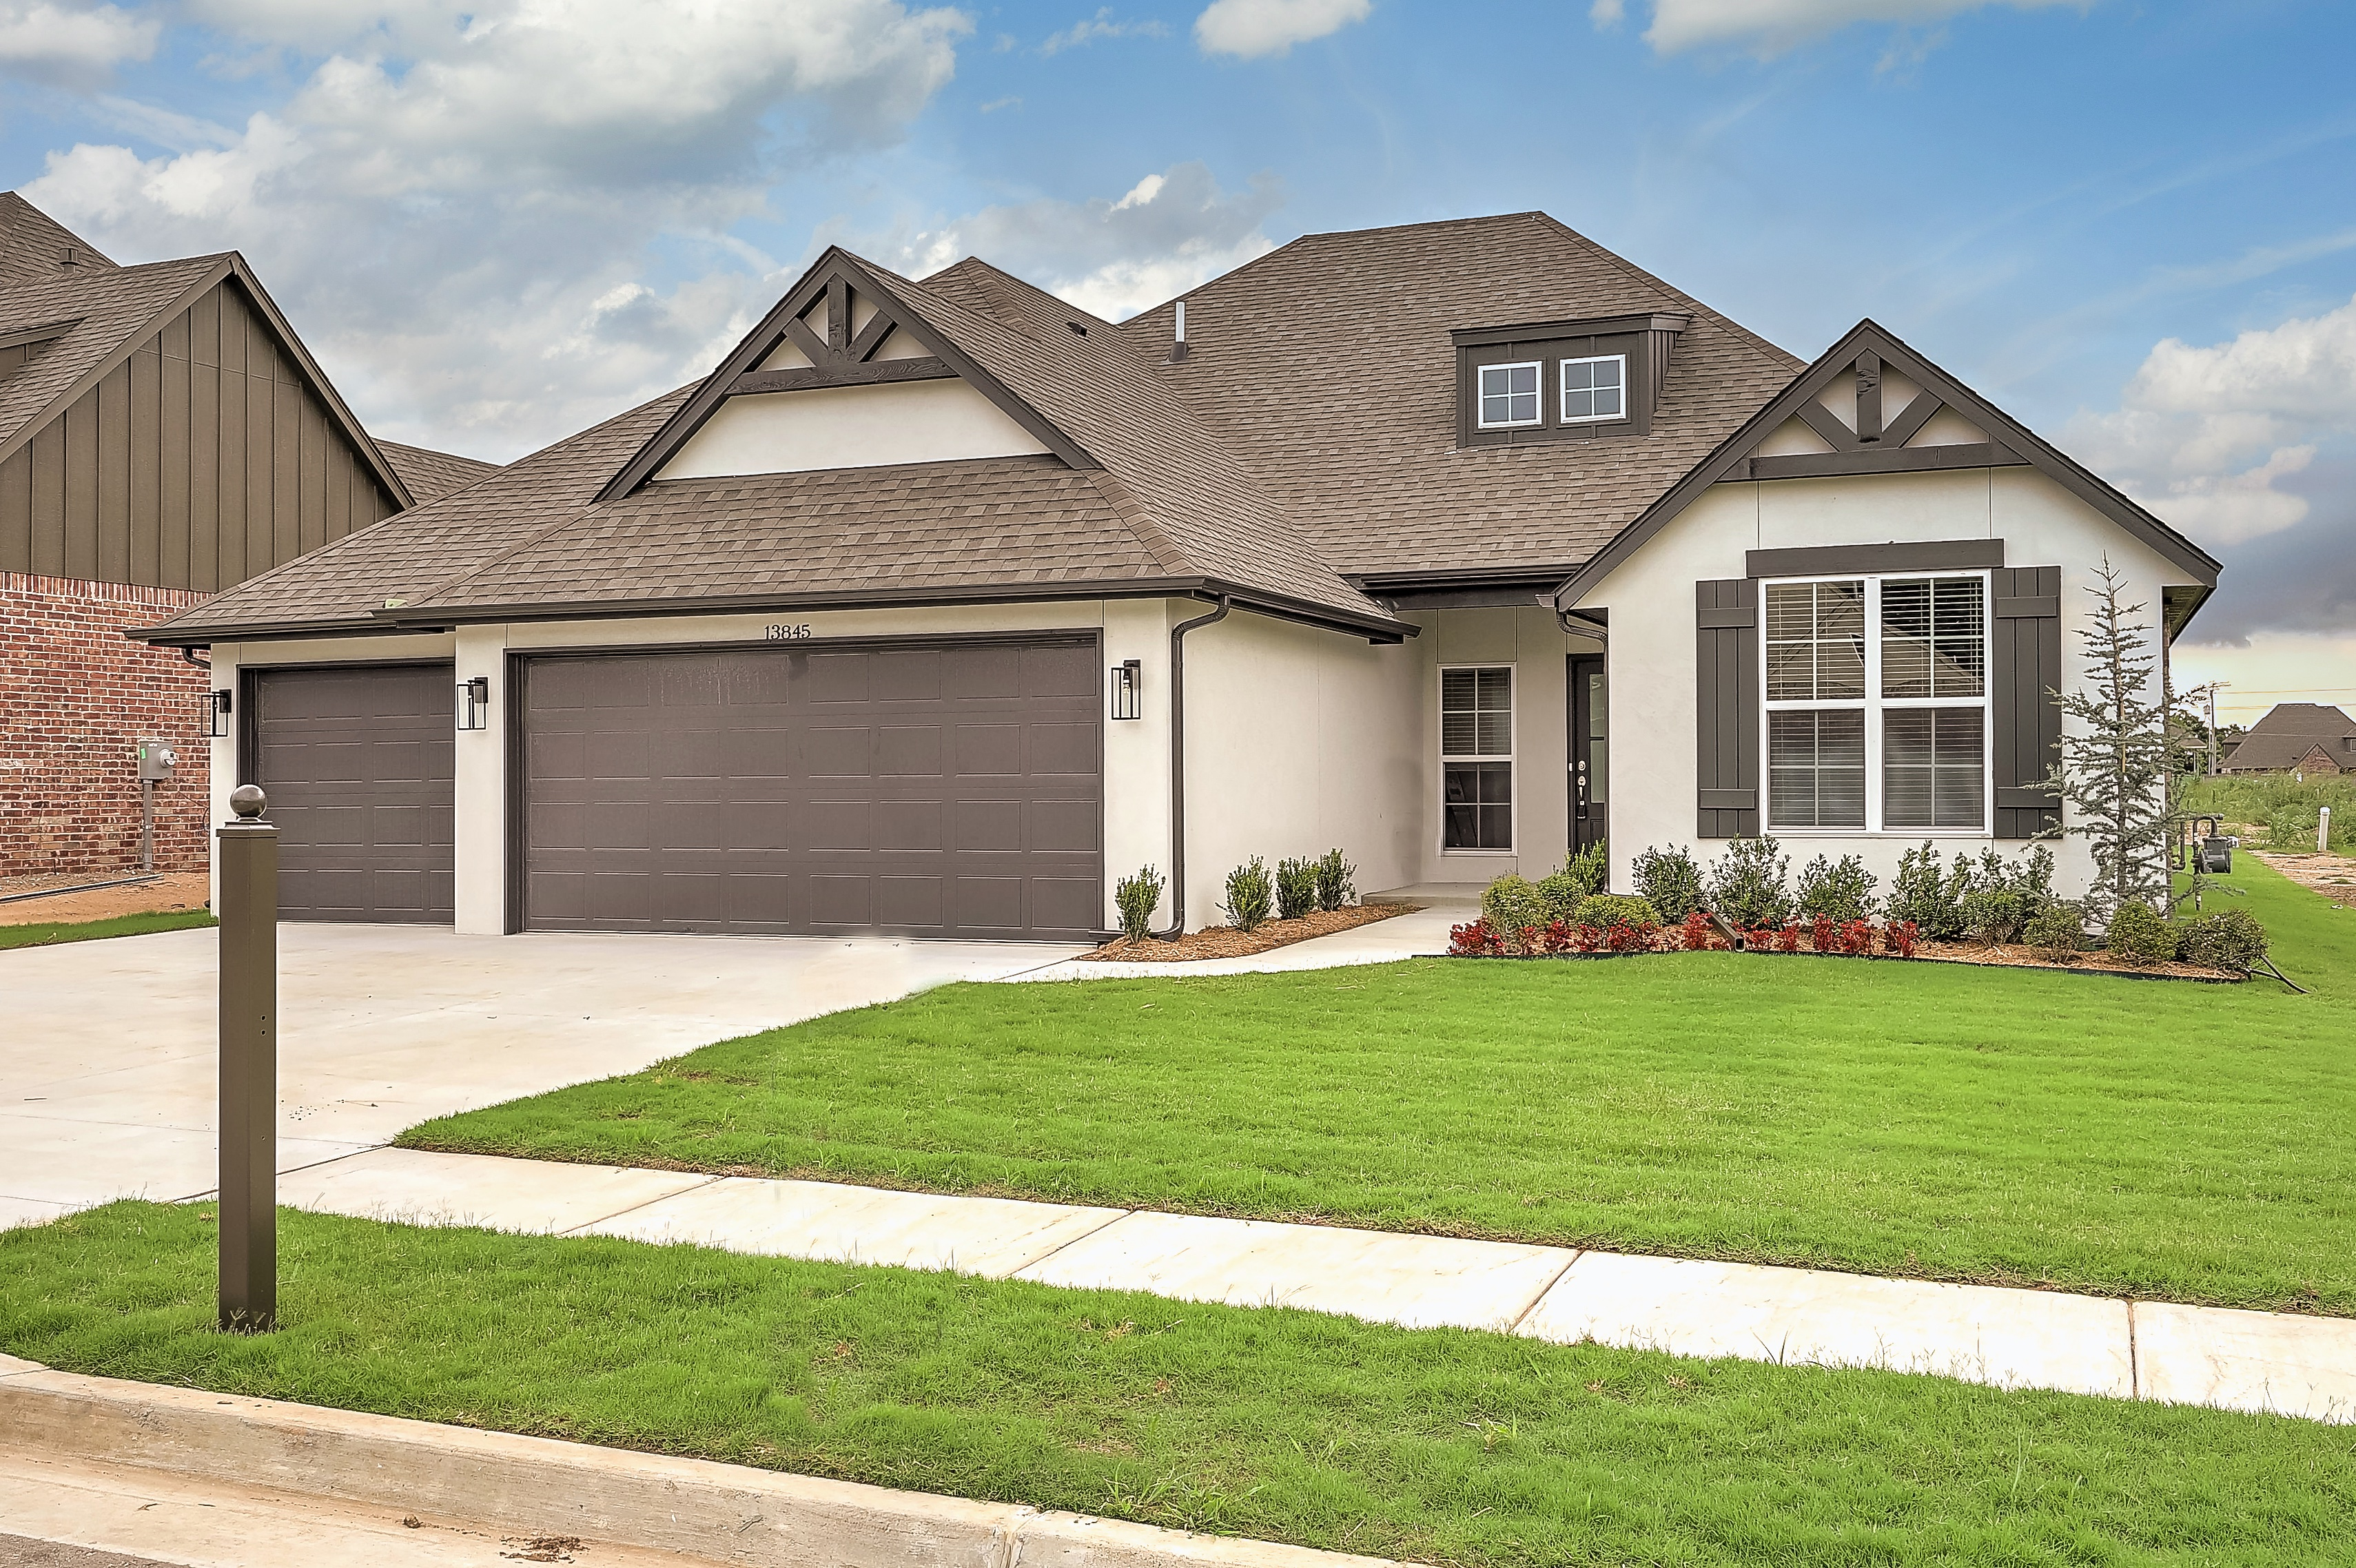 13845 S 21st Street East Property Photo 1